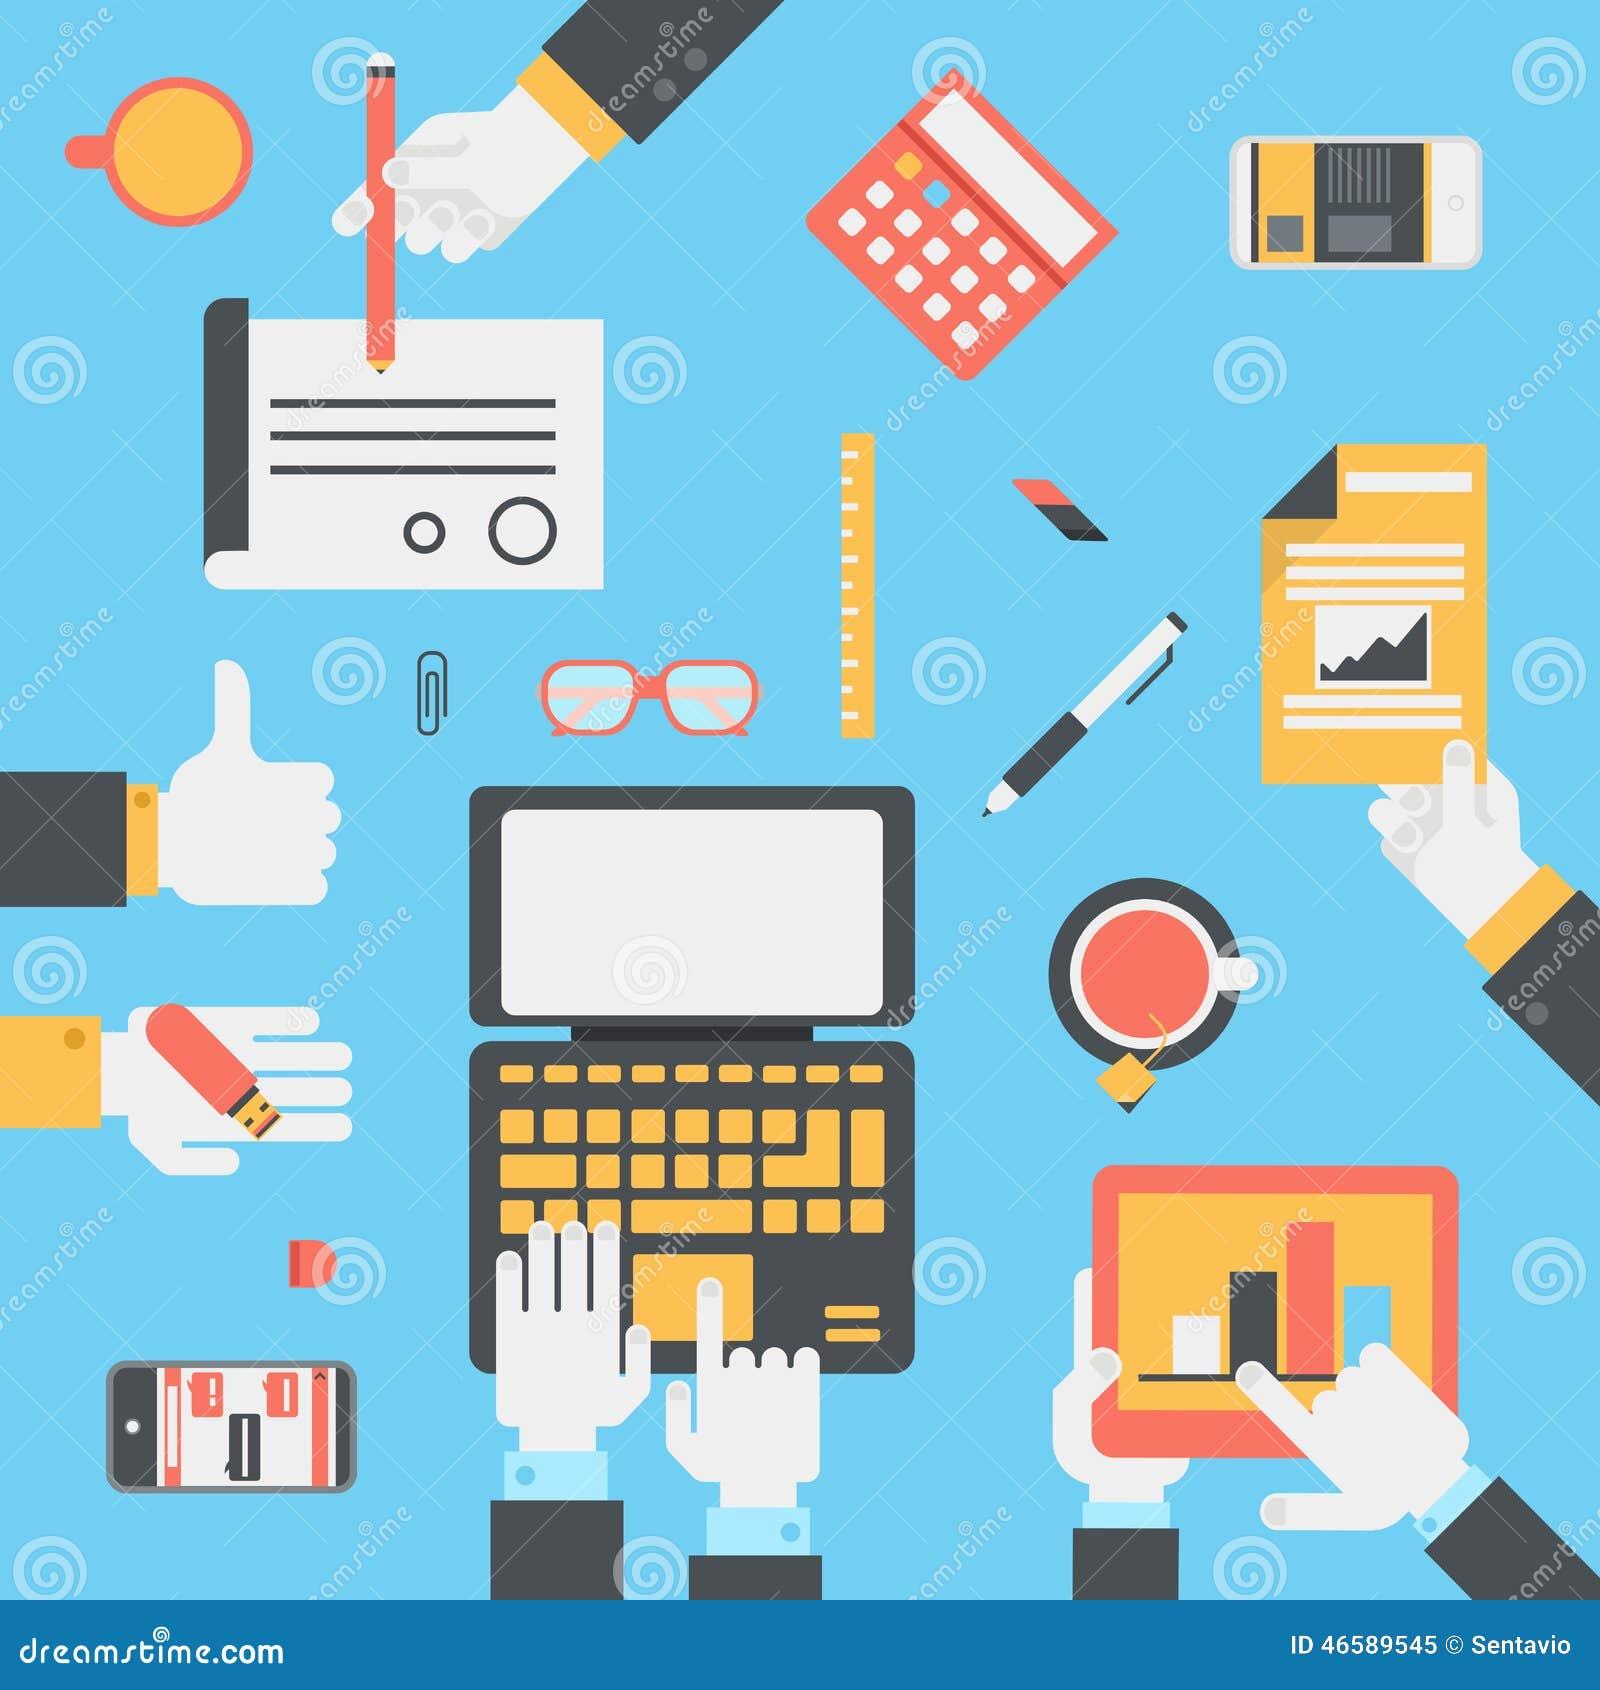 Technology Management Image: Flat Style Modern Business Technology Desktop Hands Icon